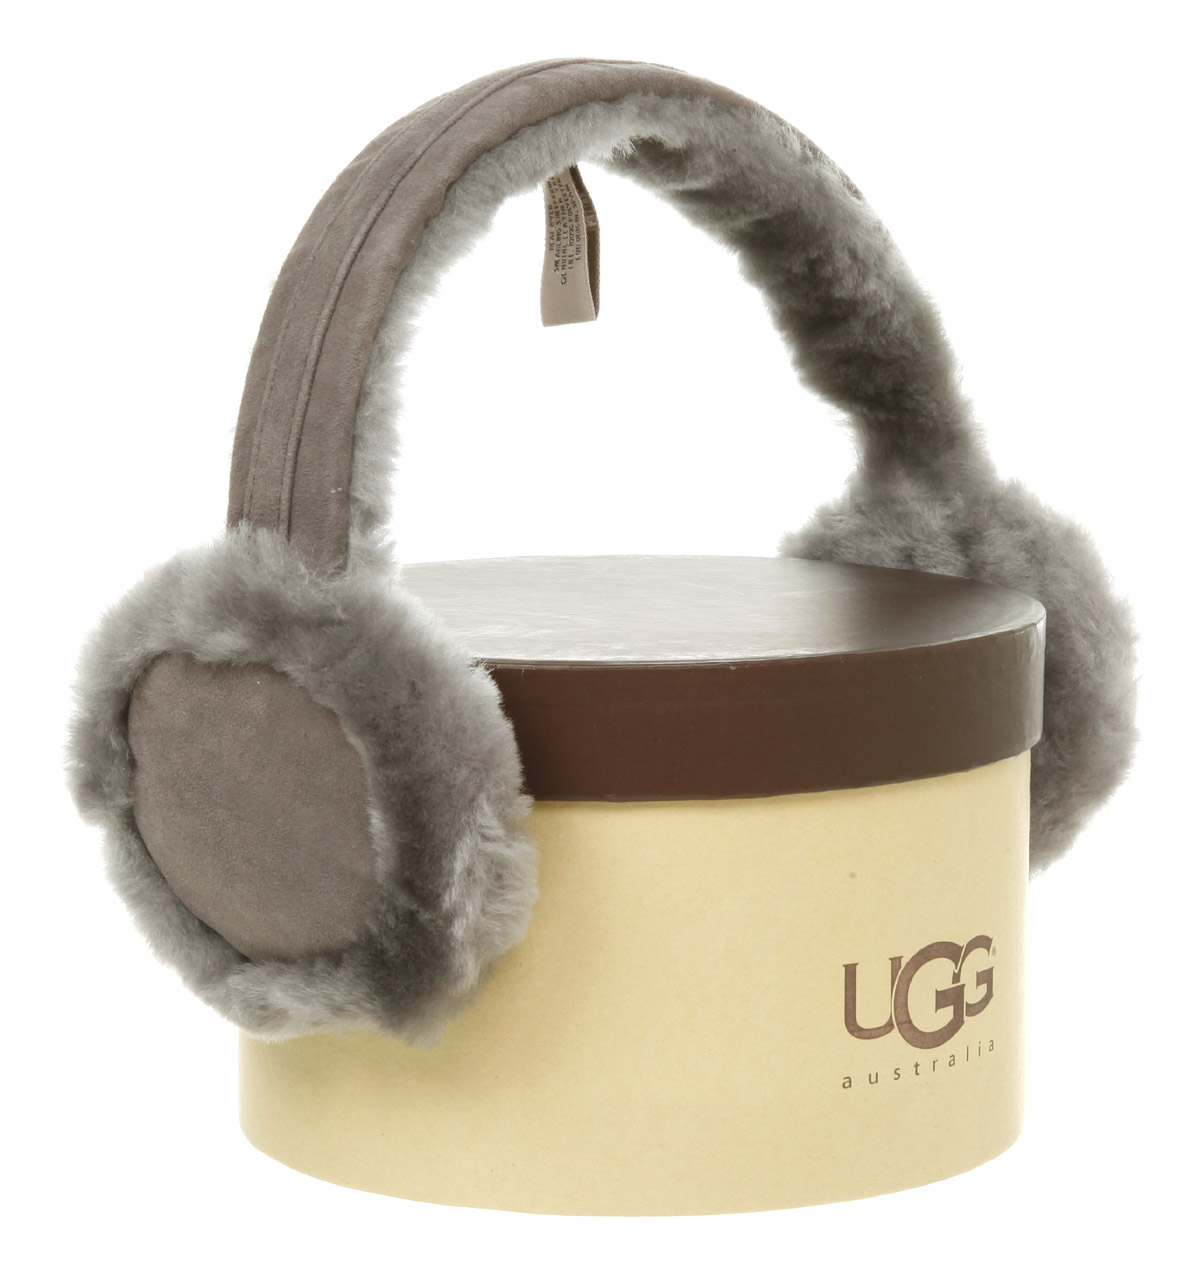 UGG Ear Muffs Grey in Gray - Lyst